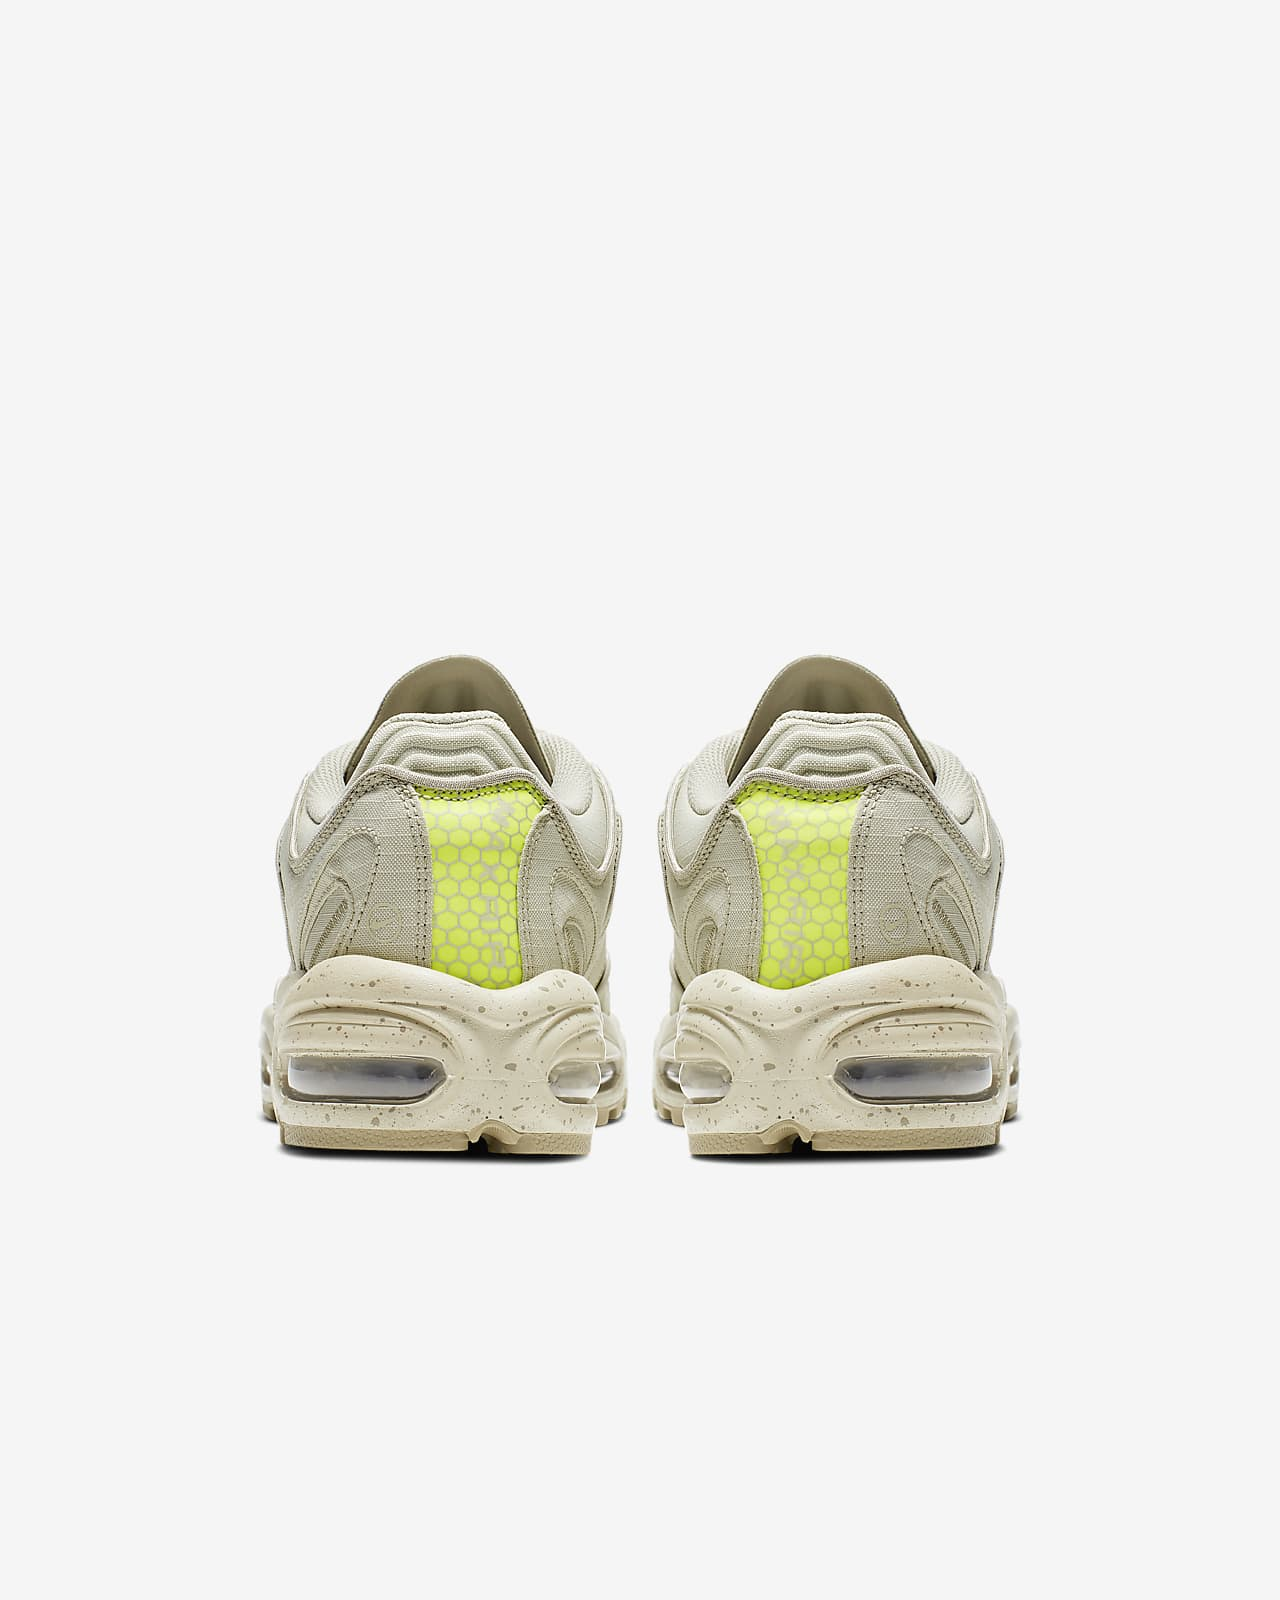 Nike Air max tailwind iv sp sneakers Beige | Luisaviaroma